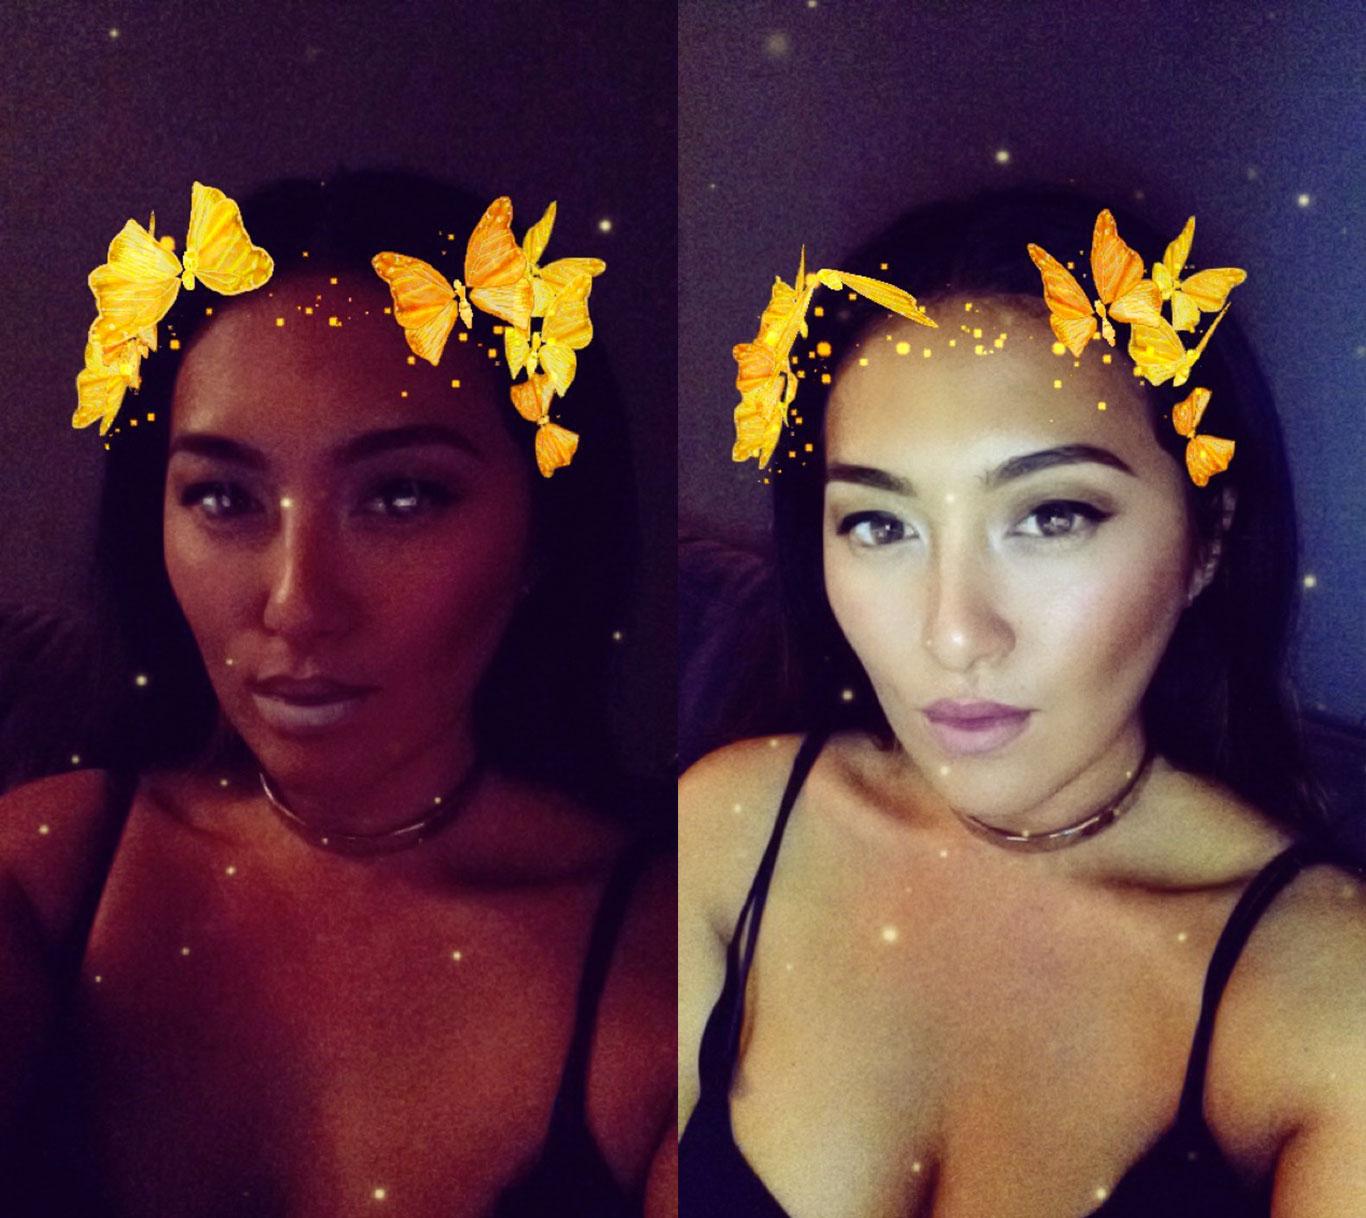 lumee-coque-kardashian-selfie-light-wahoo-snapchat-parfait